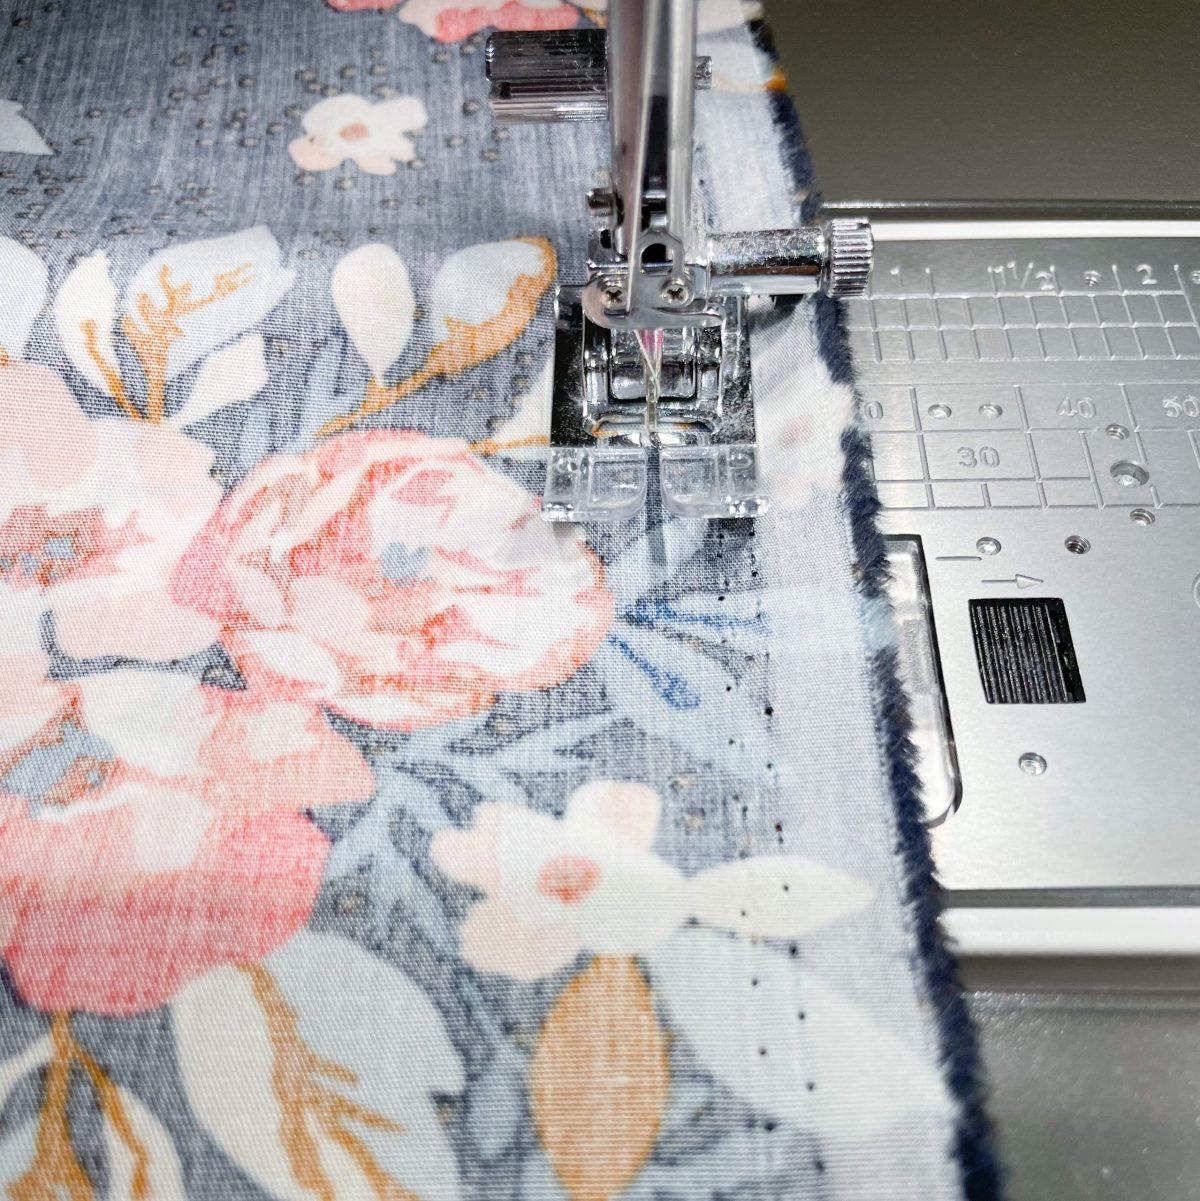 Sew along pinned edge.